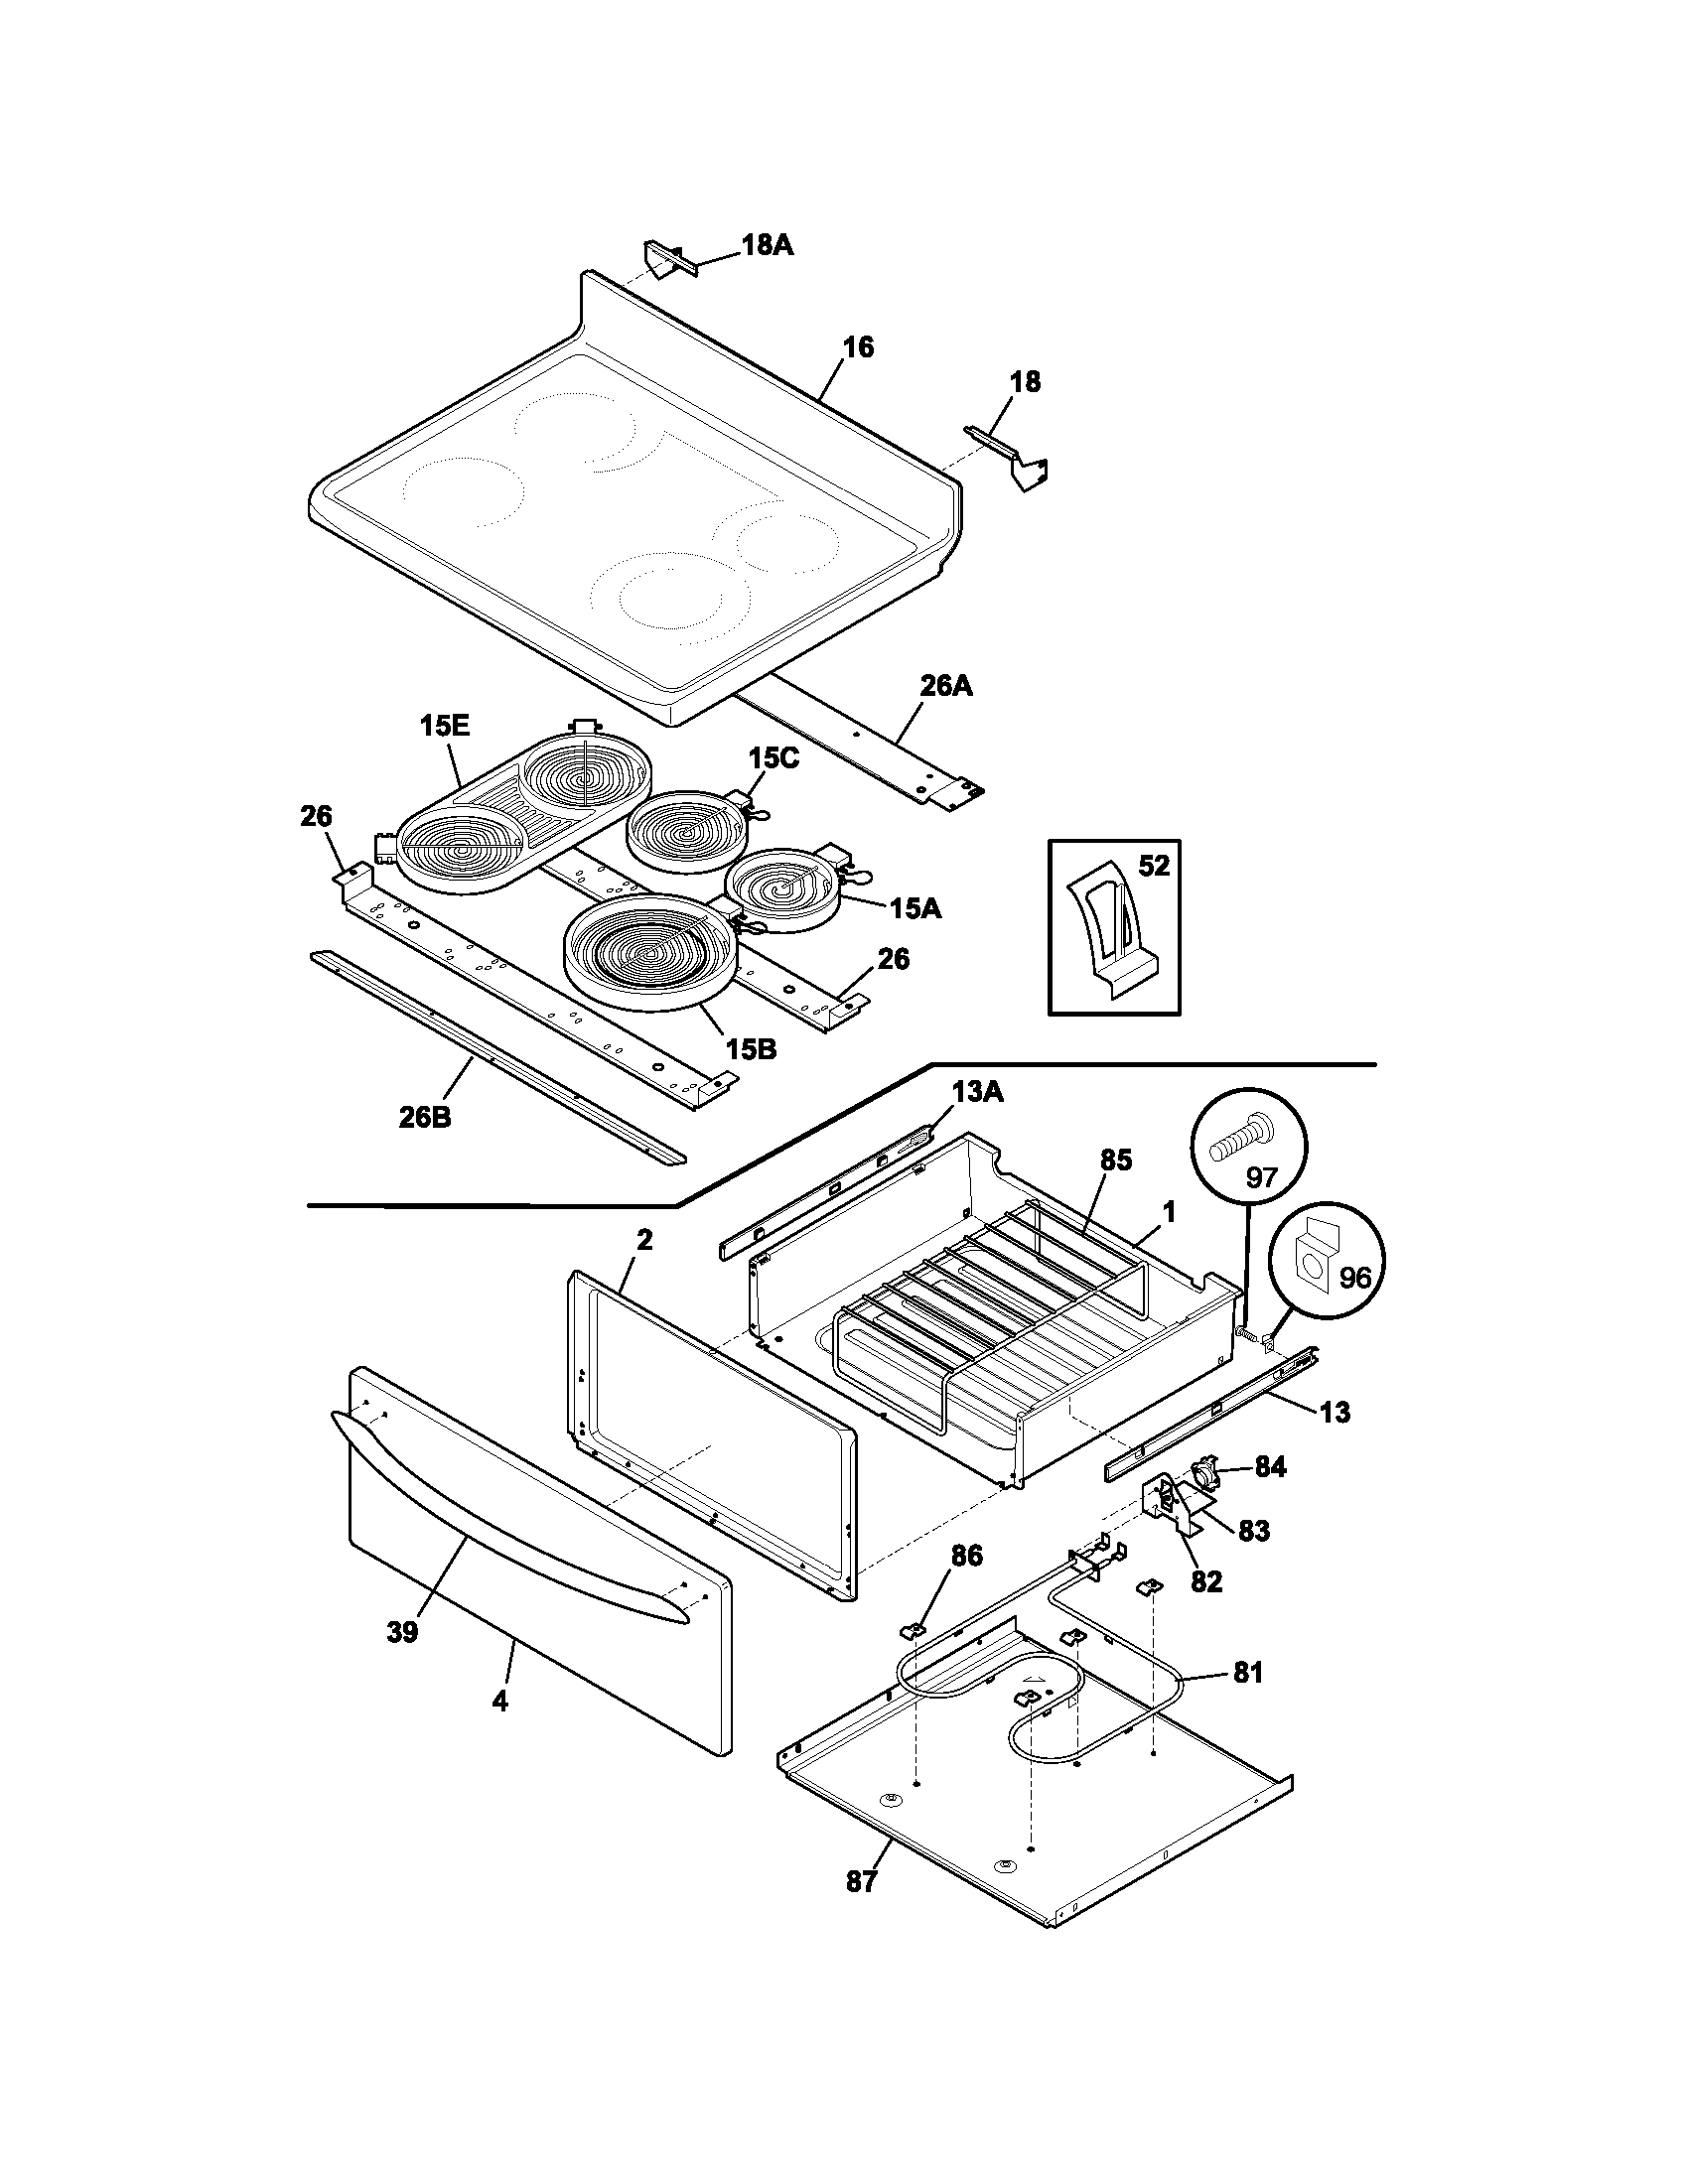 47re wiring diagram 2005 nissan altima ignition 545rfe transmission imageresizertool com